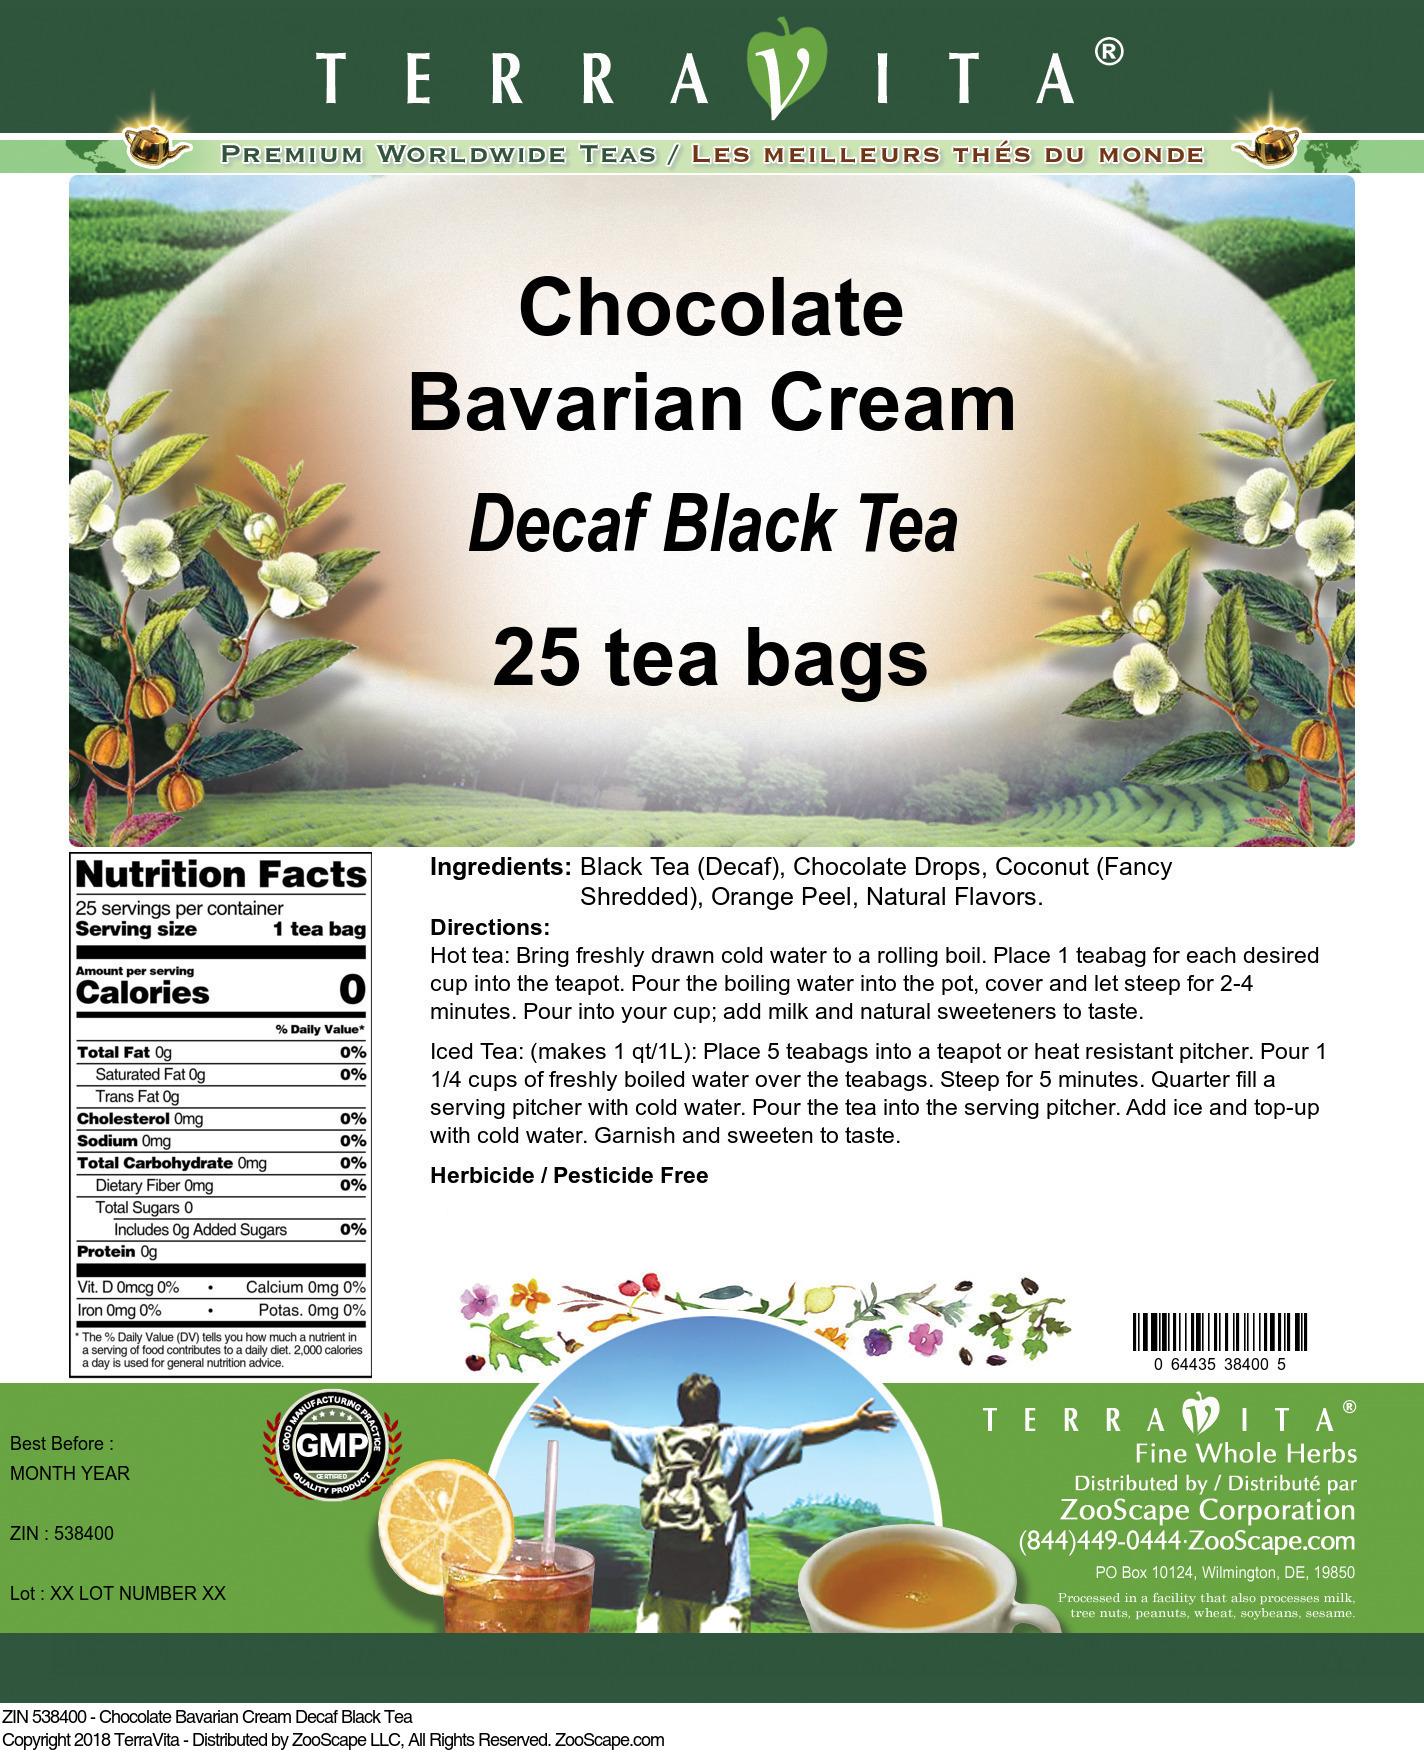 Chocolate Bavarian Cream Decaf Black Tea